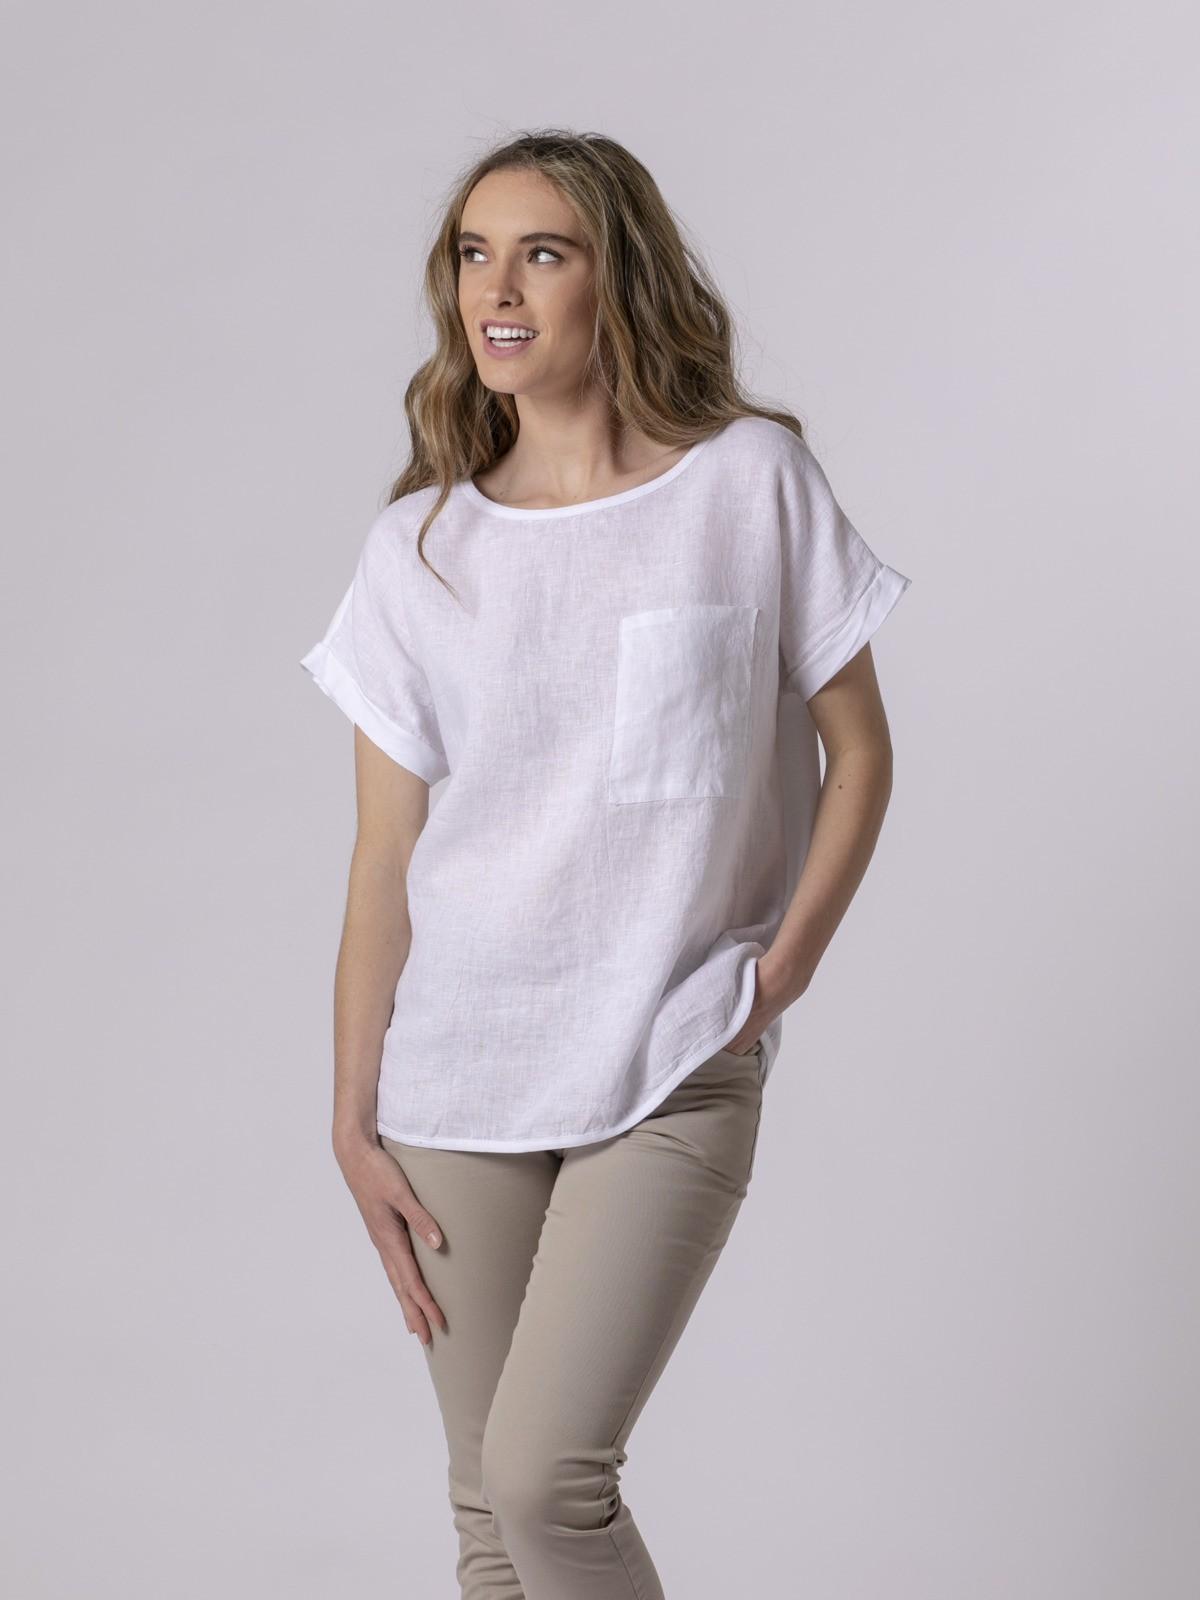 Camiseta mujer frontal de lino Blanco